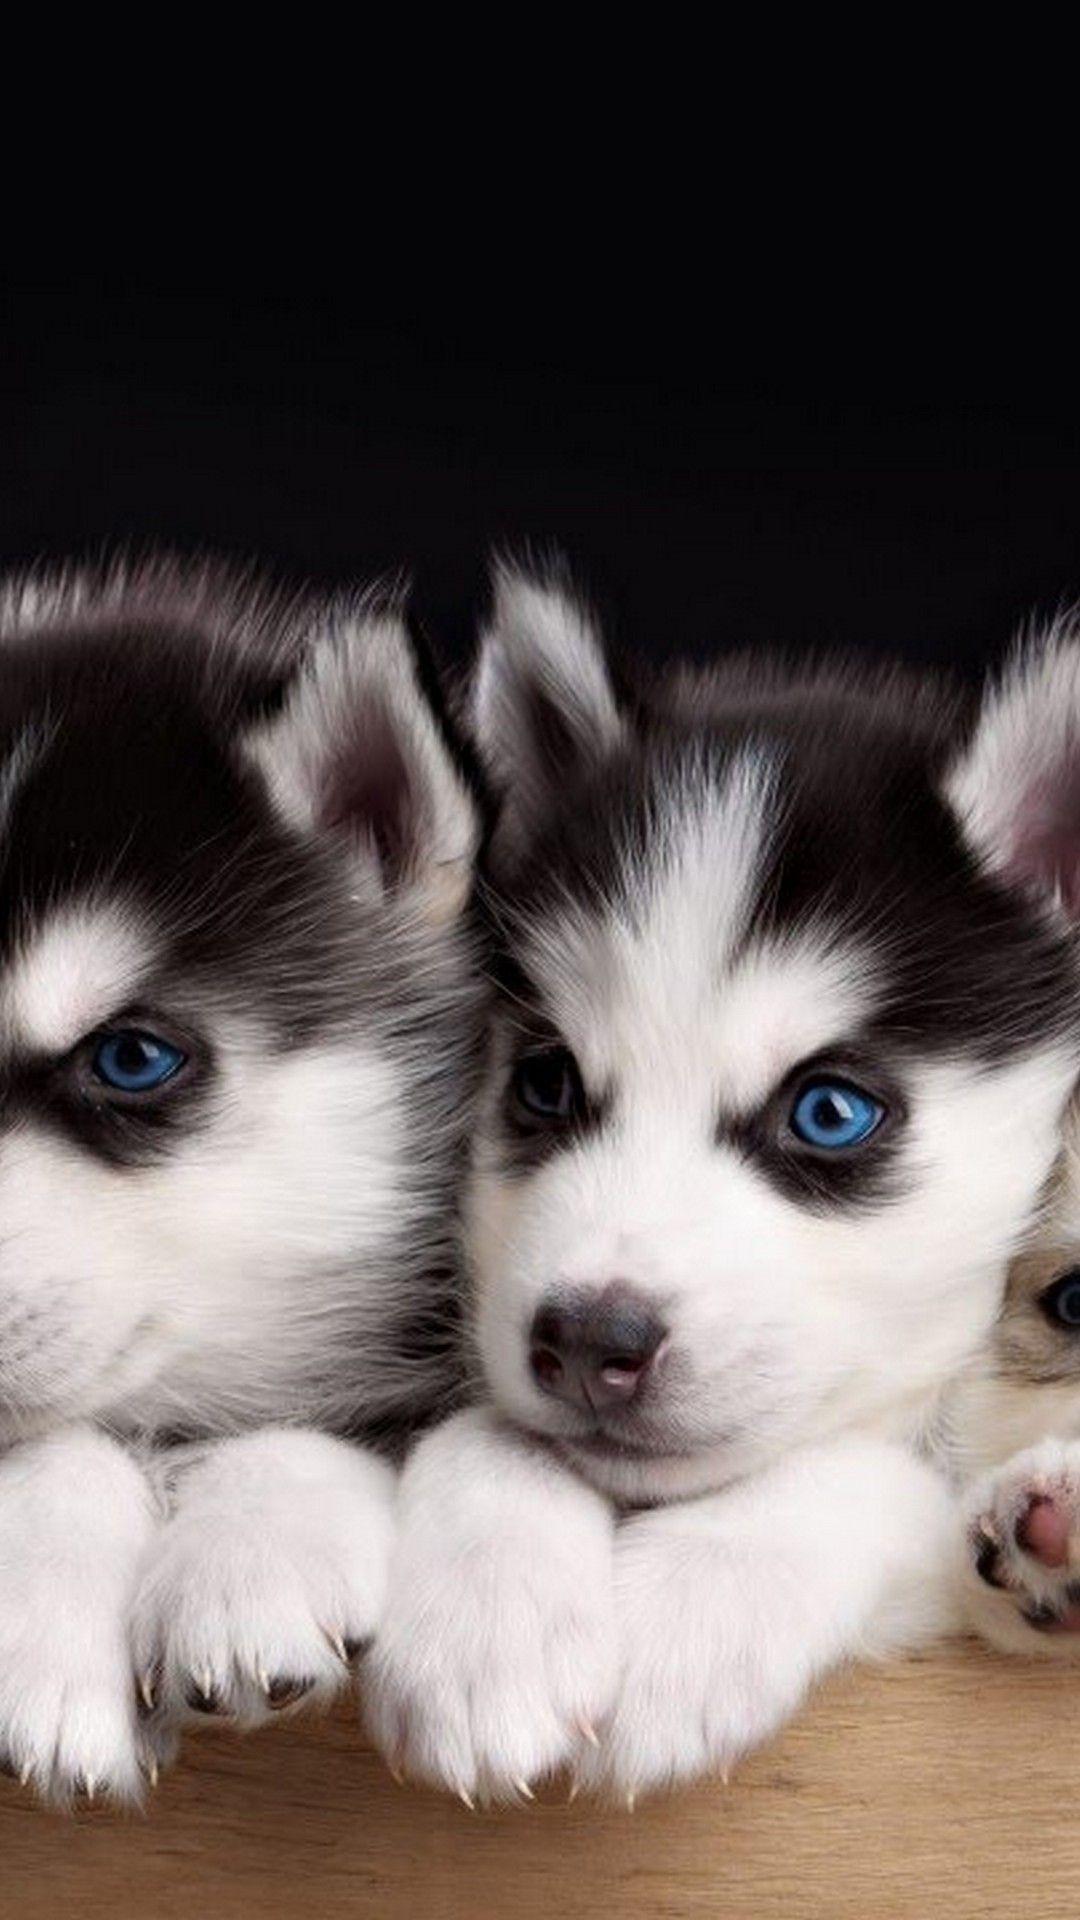 Iphone Wallpaper Cute Puppies Best Iphone Wallpaper Siberian Husky